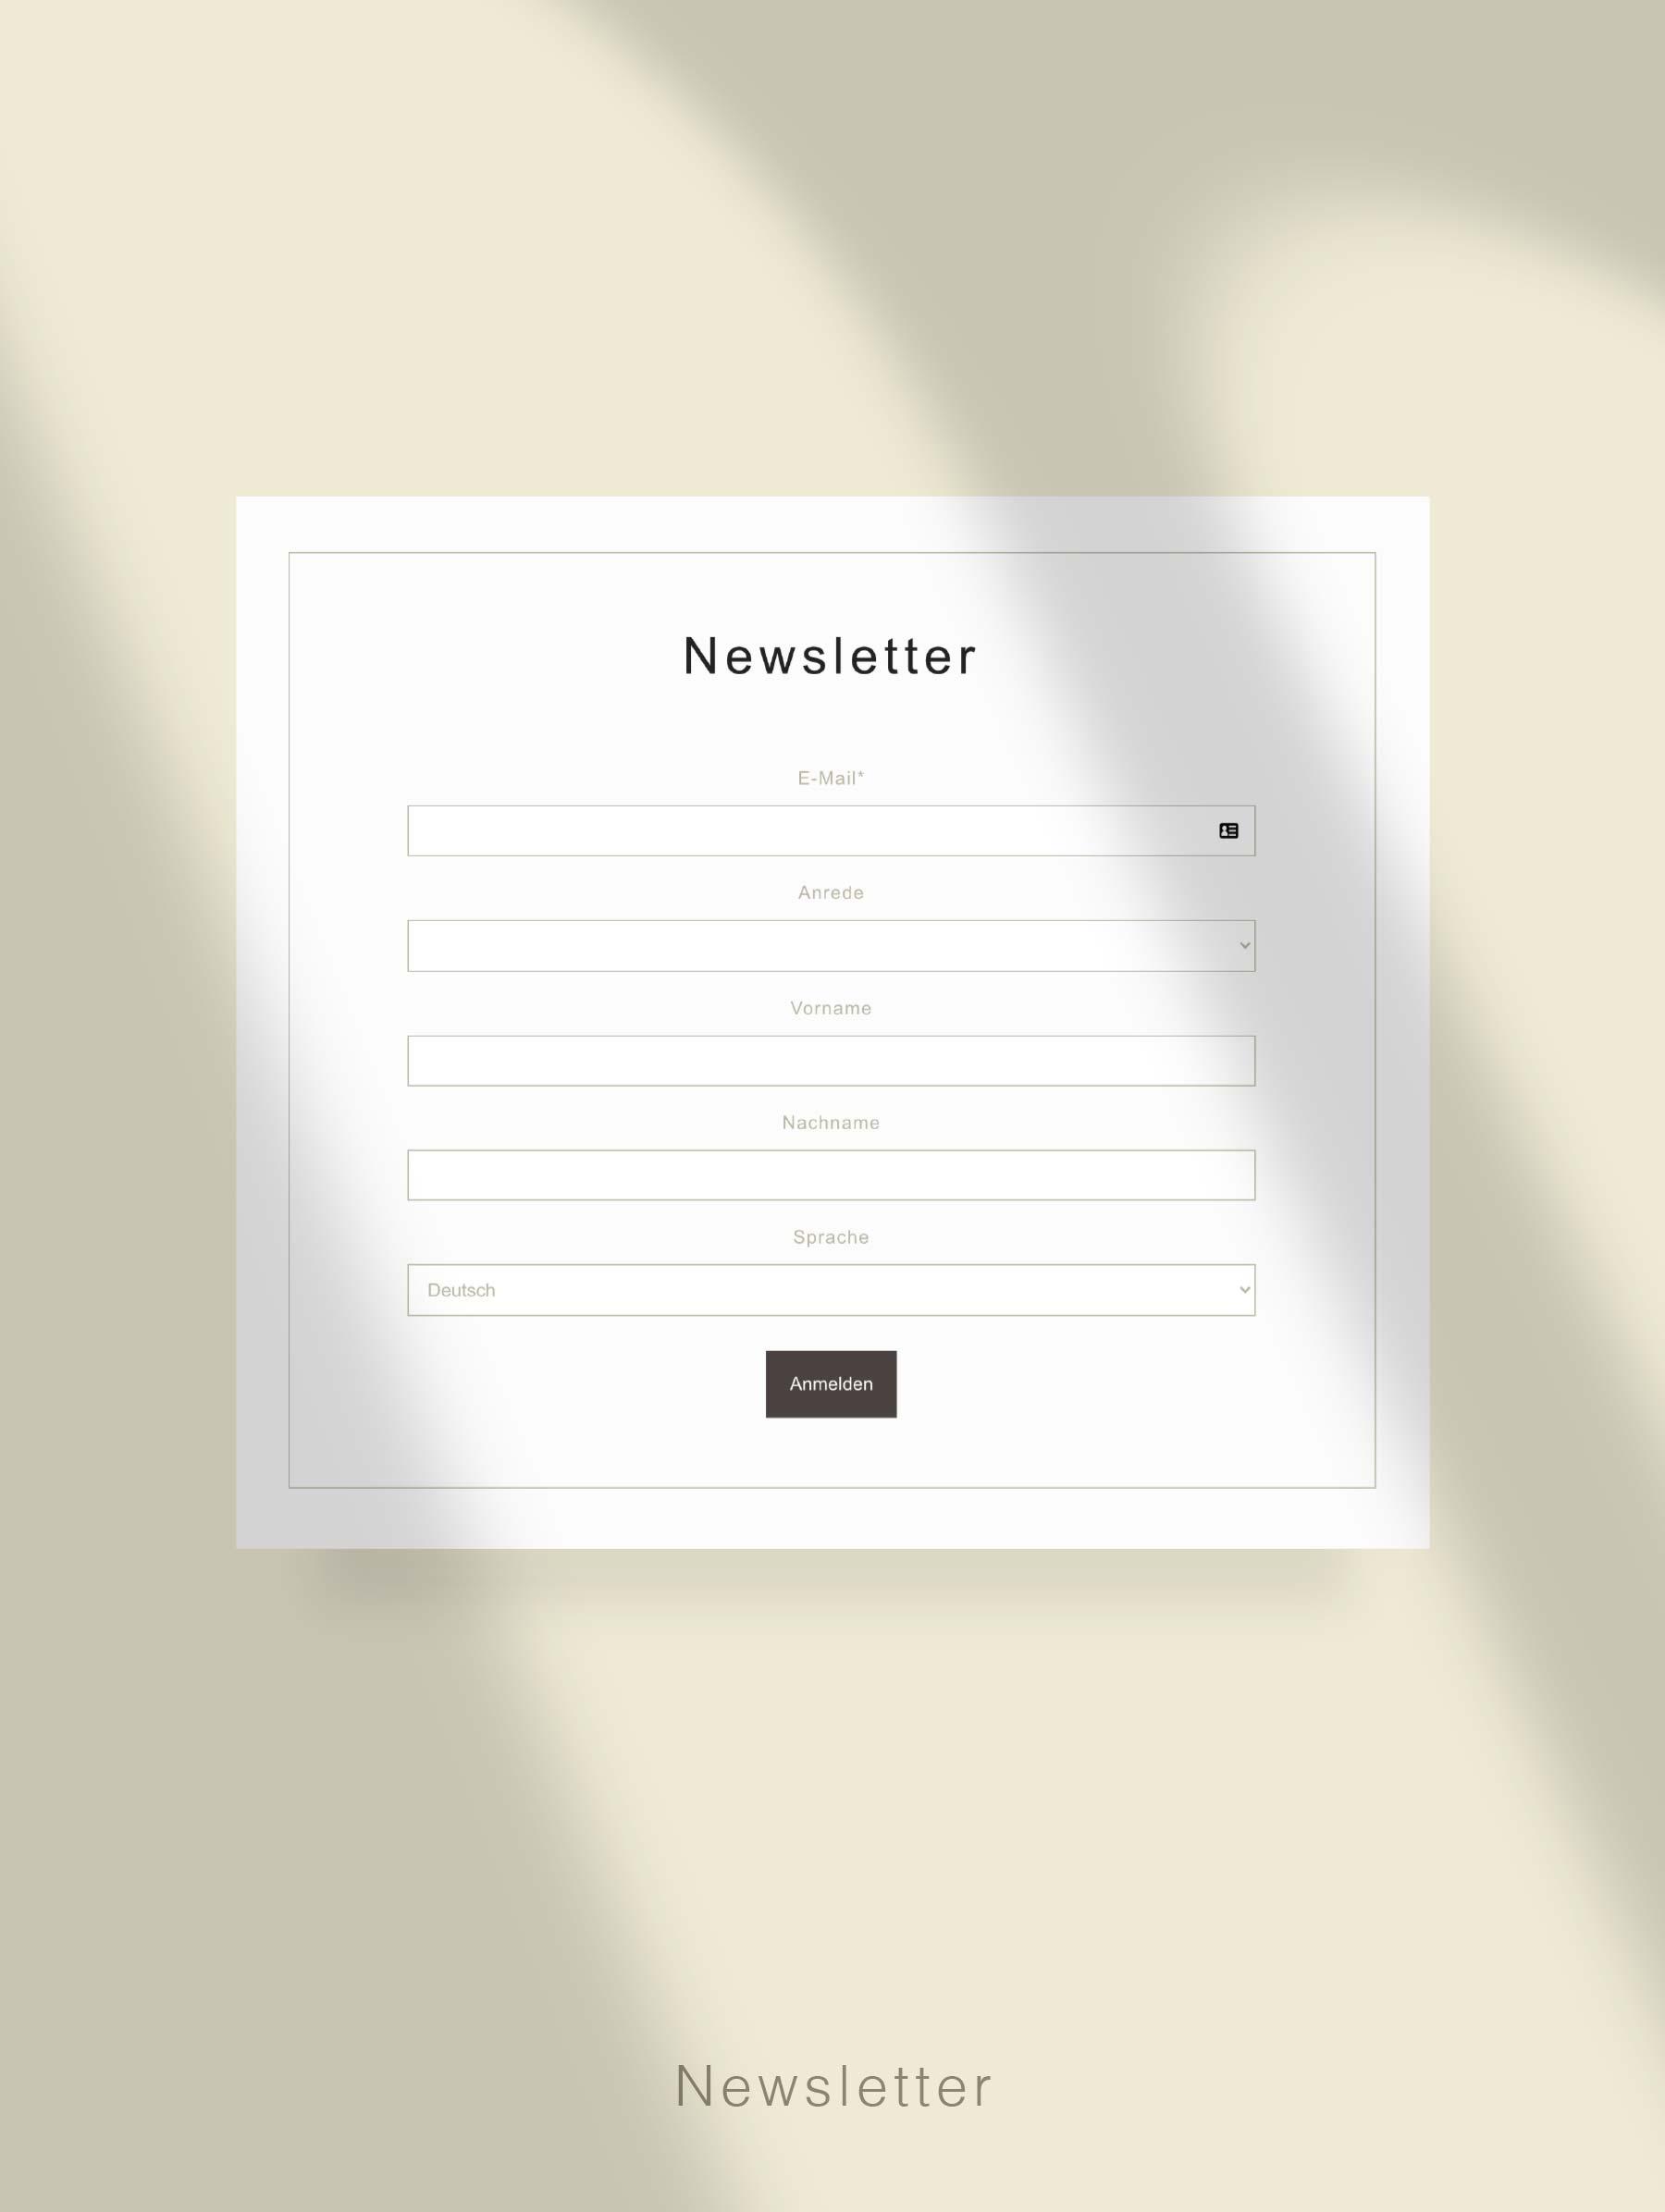 Newsletter subscription - Website development for Hotel Switzerland